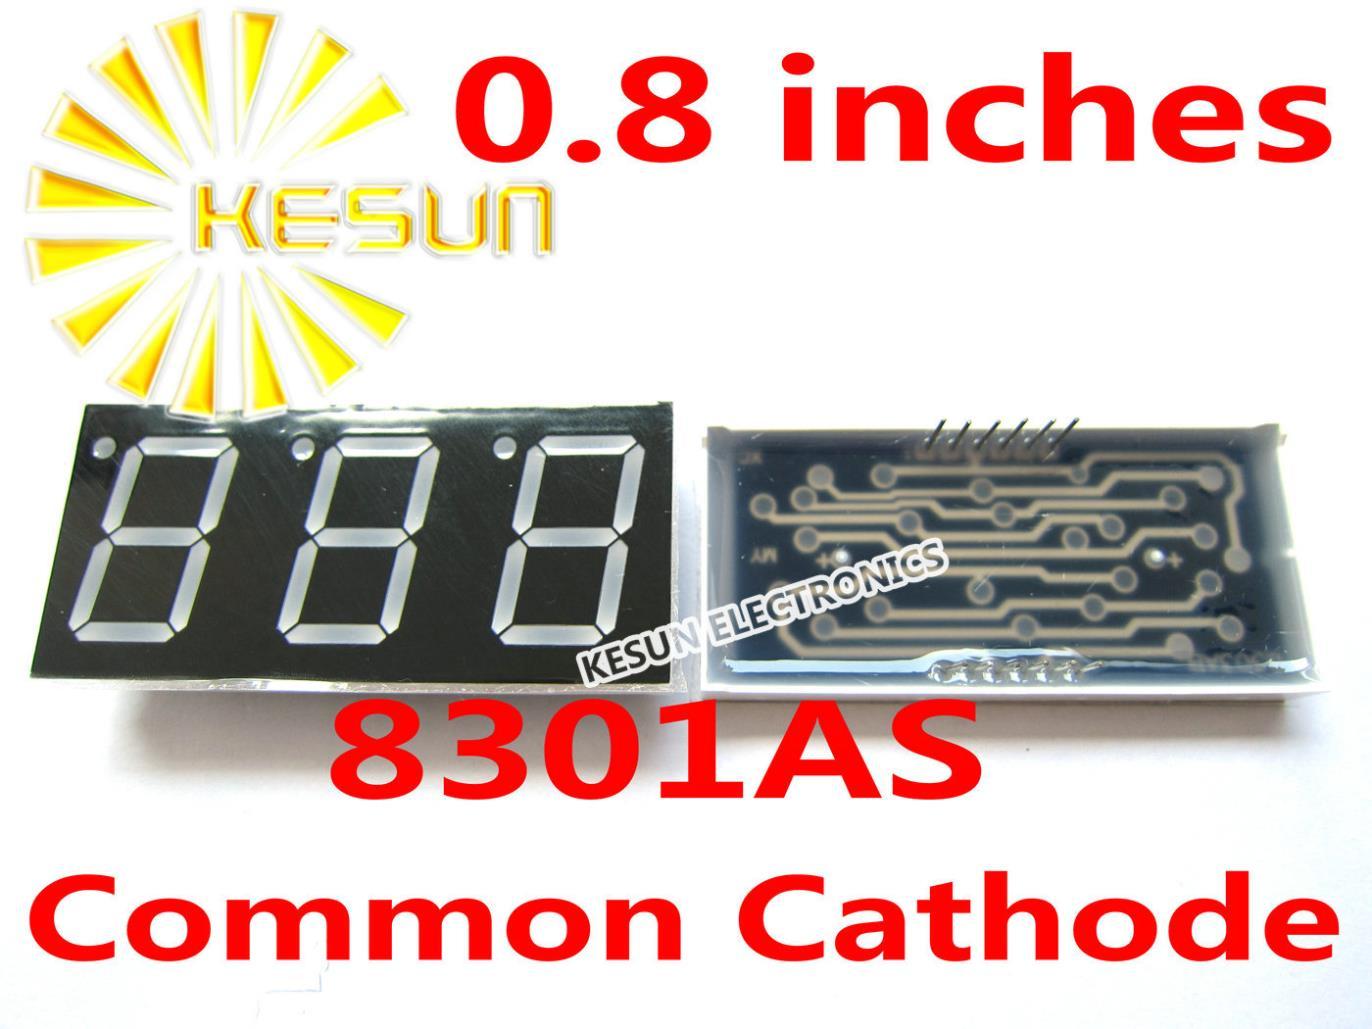 2 pcs x 0.8 polegadas Red Common Cathode/Ânodo 8301AS 8301BS 3 Tubo Digital Módulo de Display LED Contas de Luz